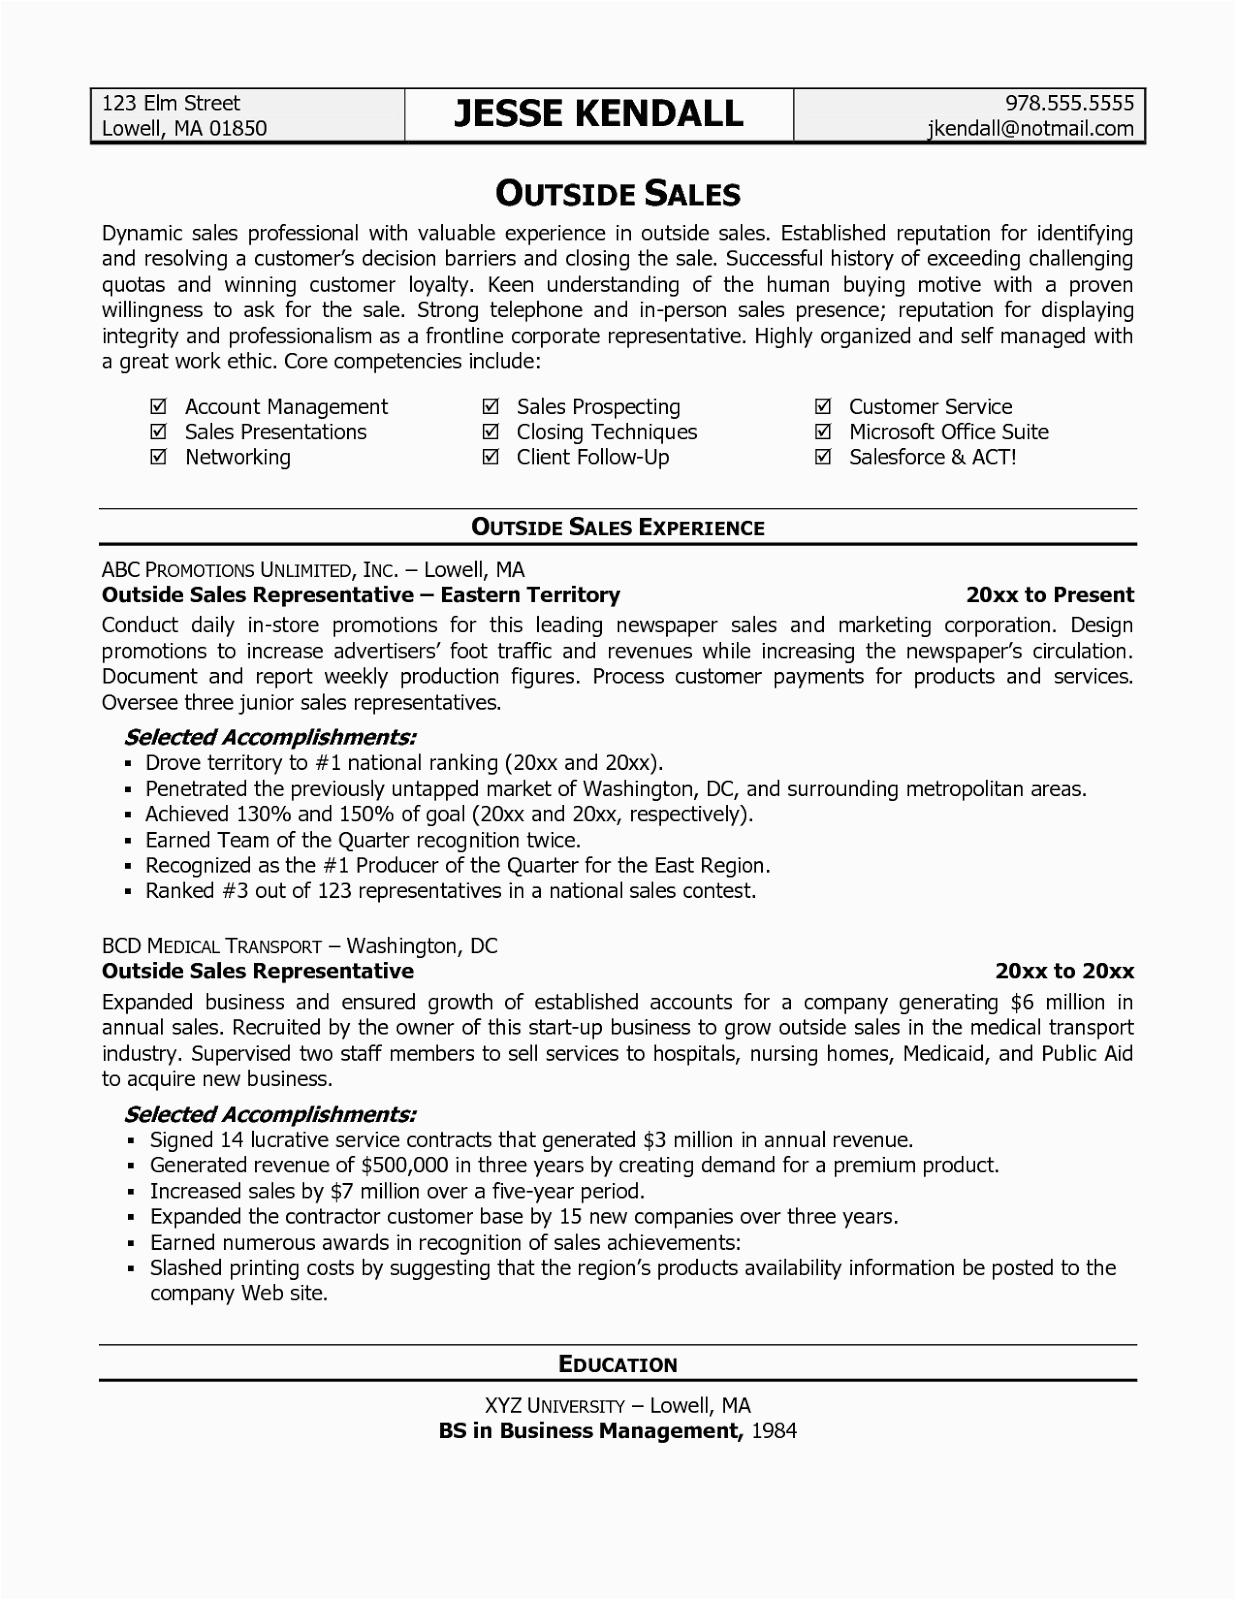 sales resume templates free